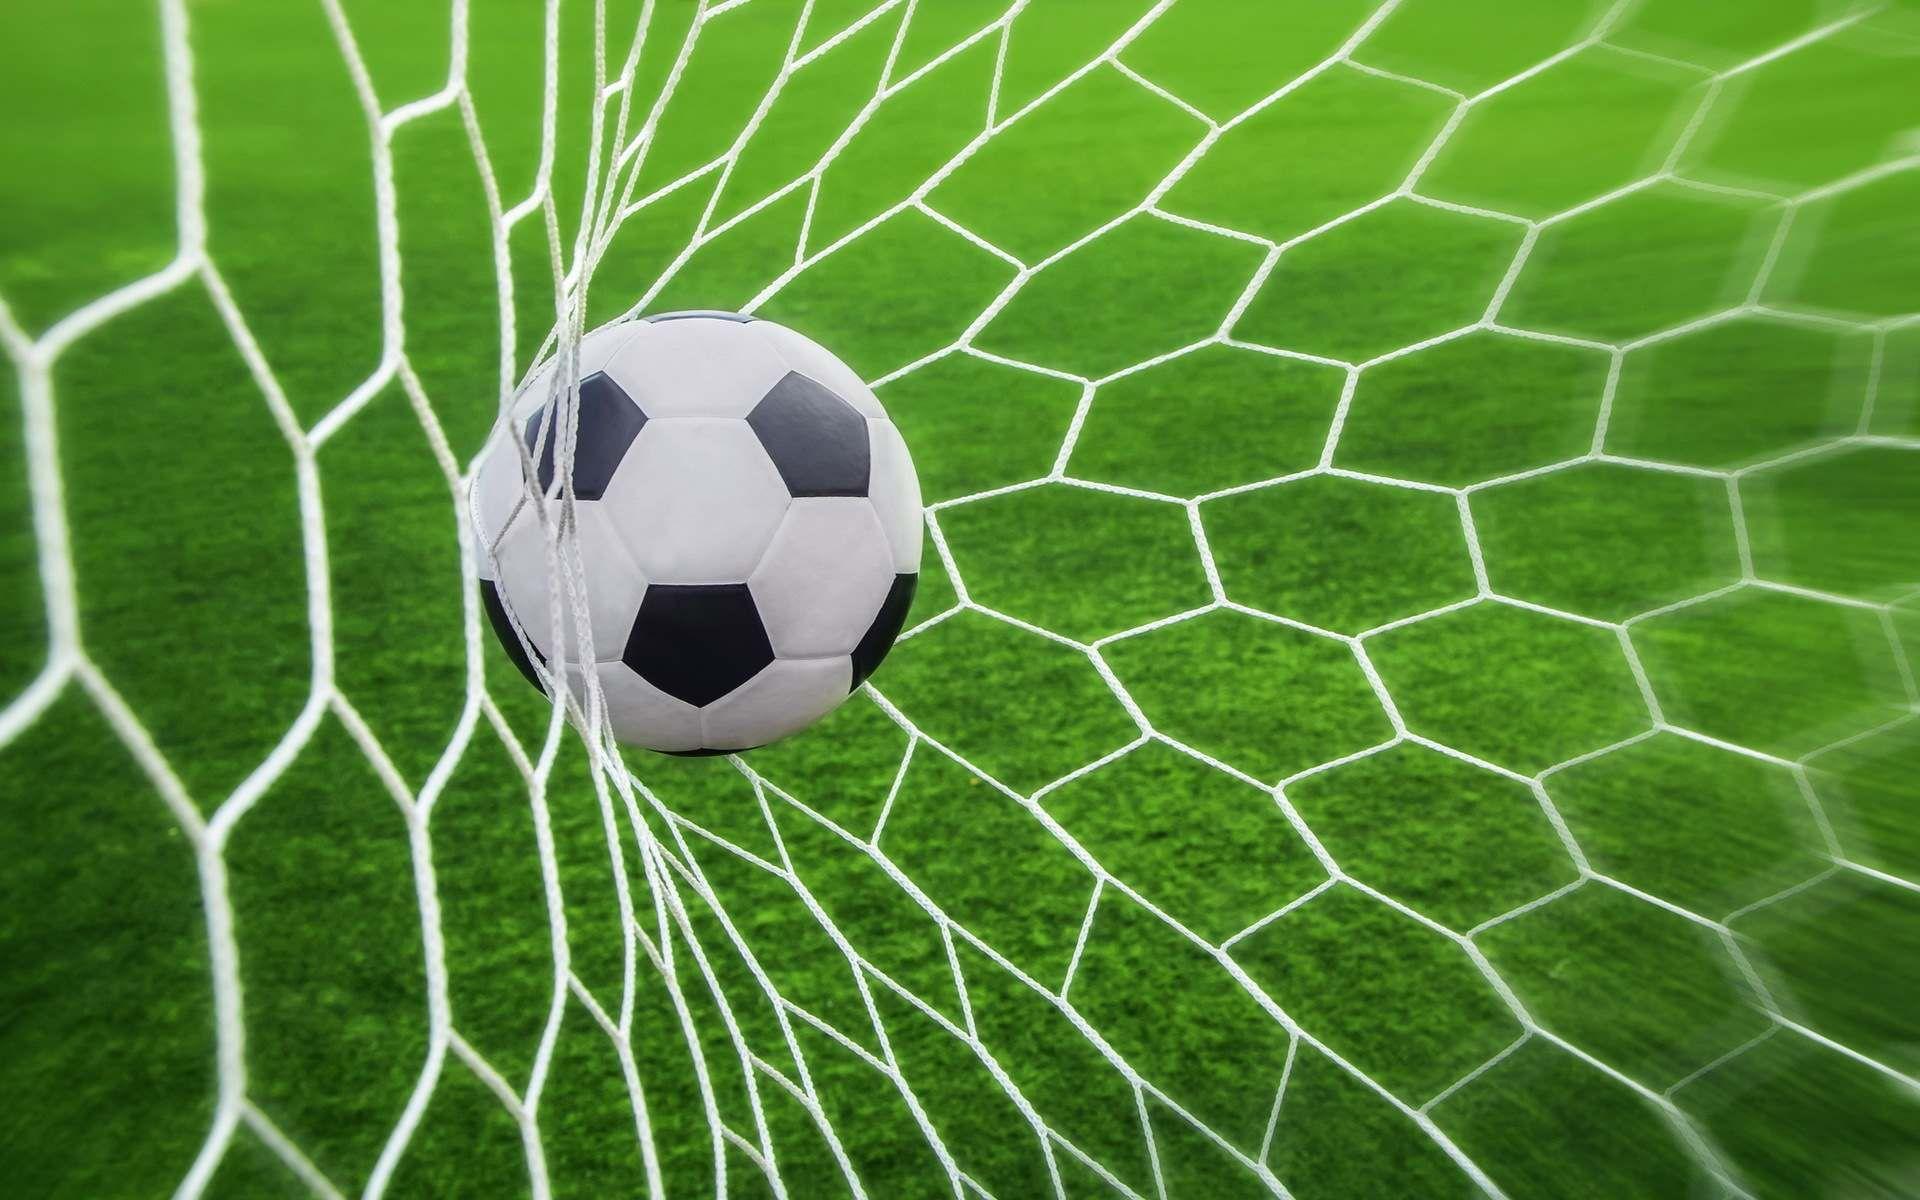 Download Wallpaper High Quality Football - a6bc72ca0c2be9be49ccfaa5c37944e6  Snapshot_13877.jpg